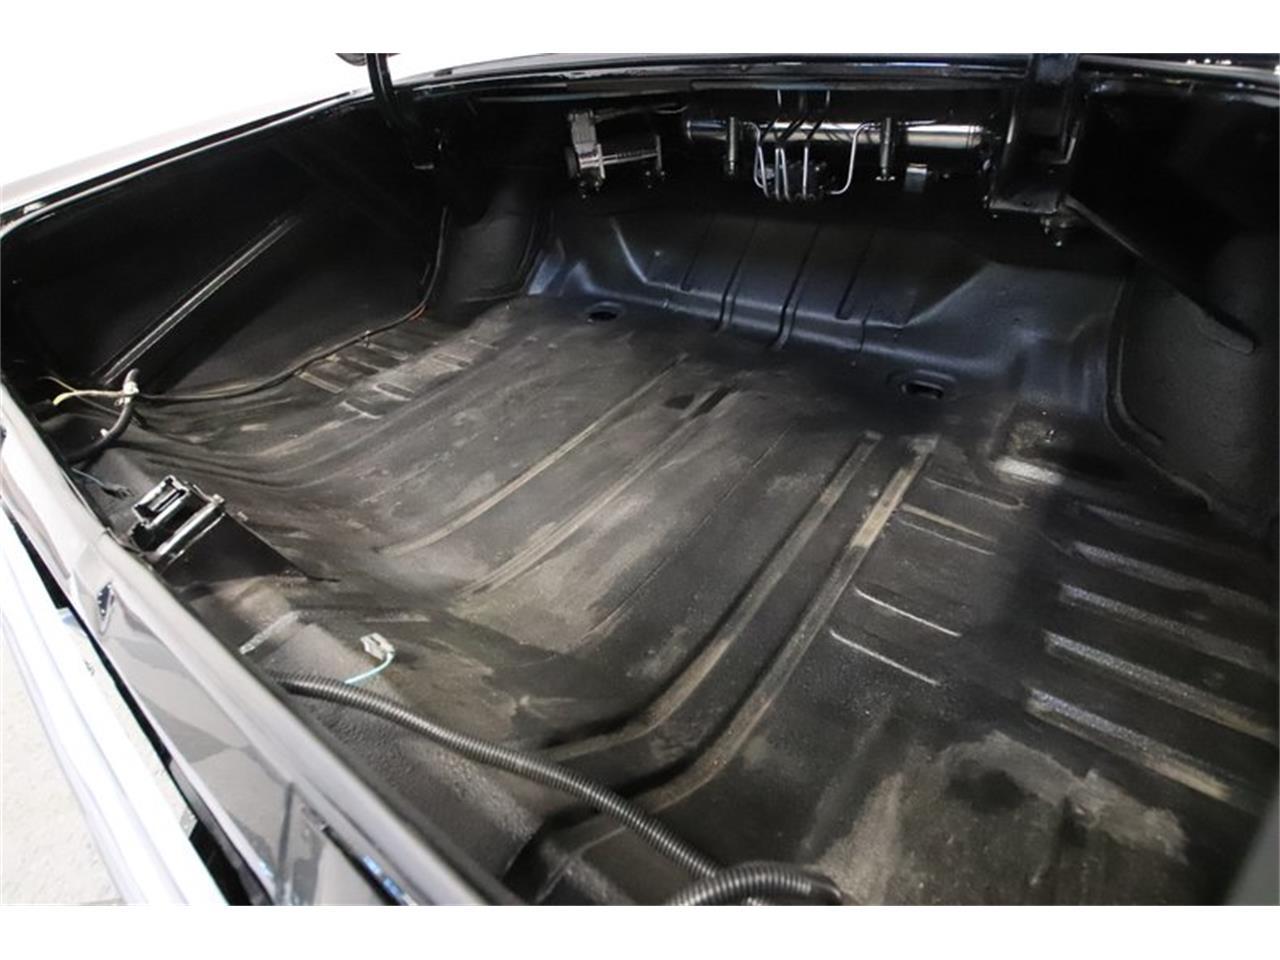 Large Picture of Classic '66 Chevrolet Impala located in Mesa Arizona - $52,995.00 - Q2EF